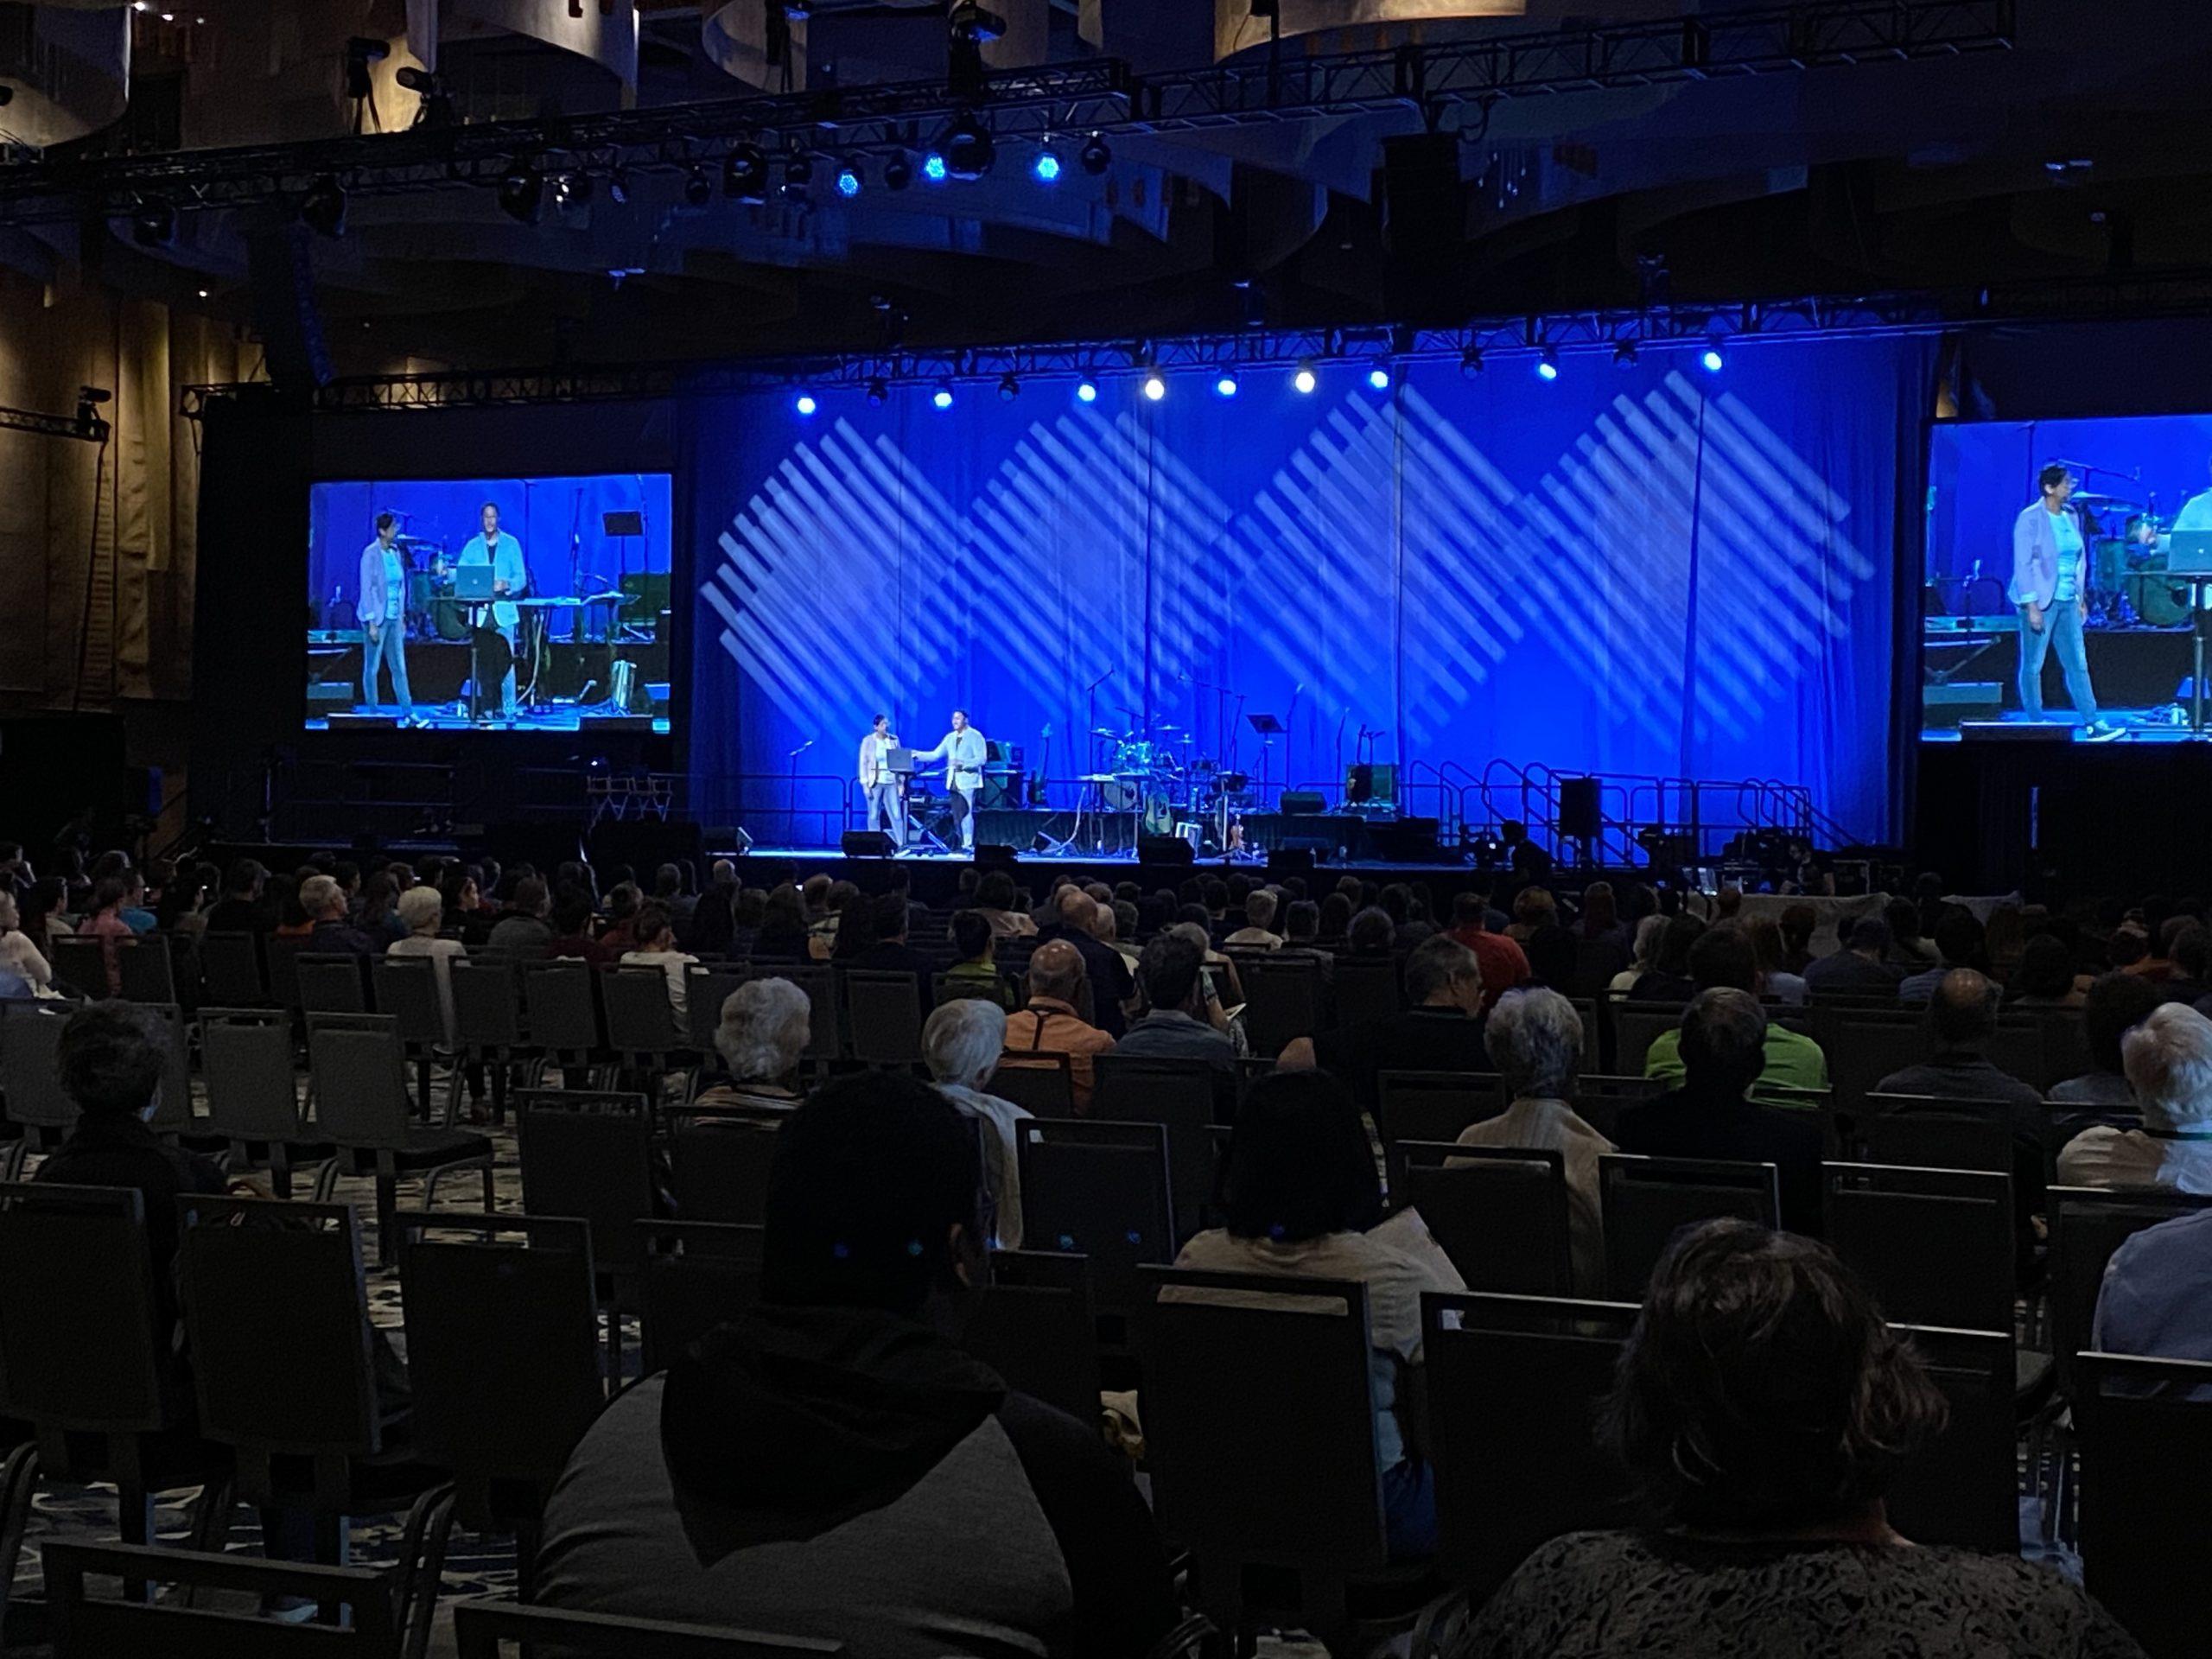 MennoCon21 first Worship evening. Speakers Pastor Lesley Francisco McClendon and Pasor Caleb McClendon of C3 - Calvary Community Church, Hampton, Virginia.